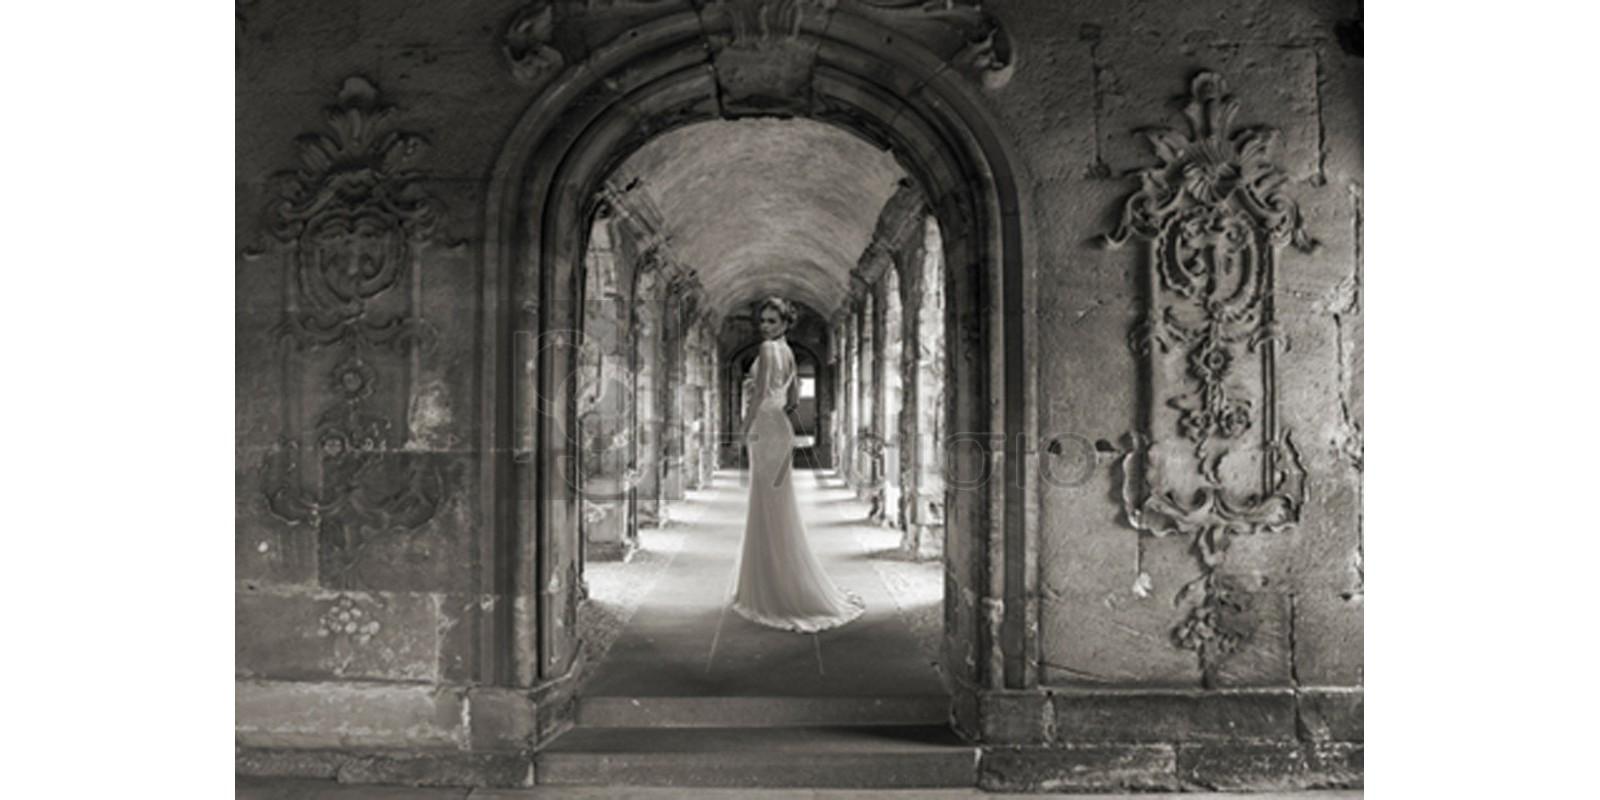 Haute Photo Collection - Under a Roman Colonnade